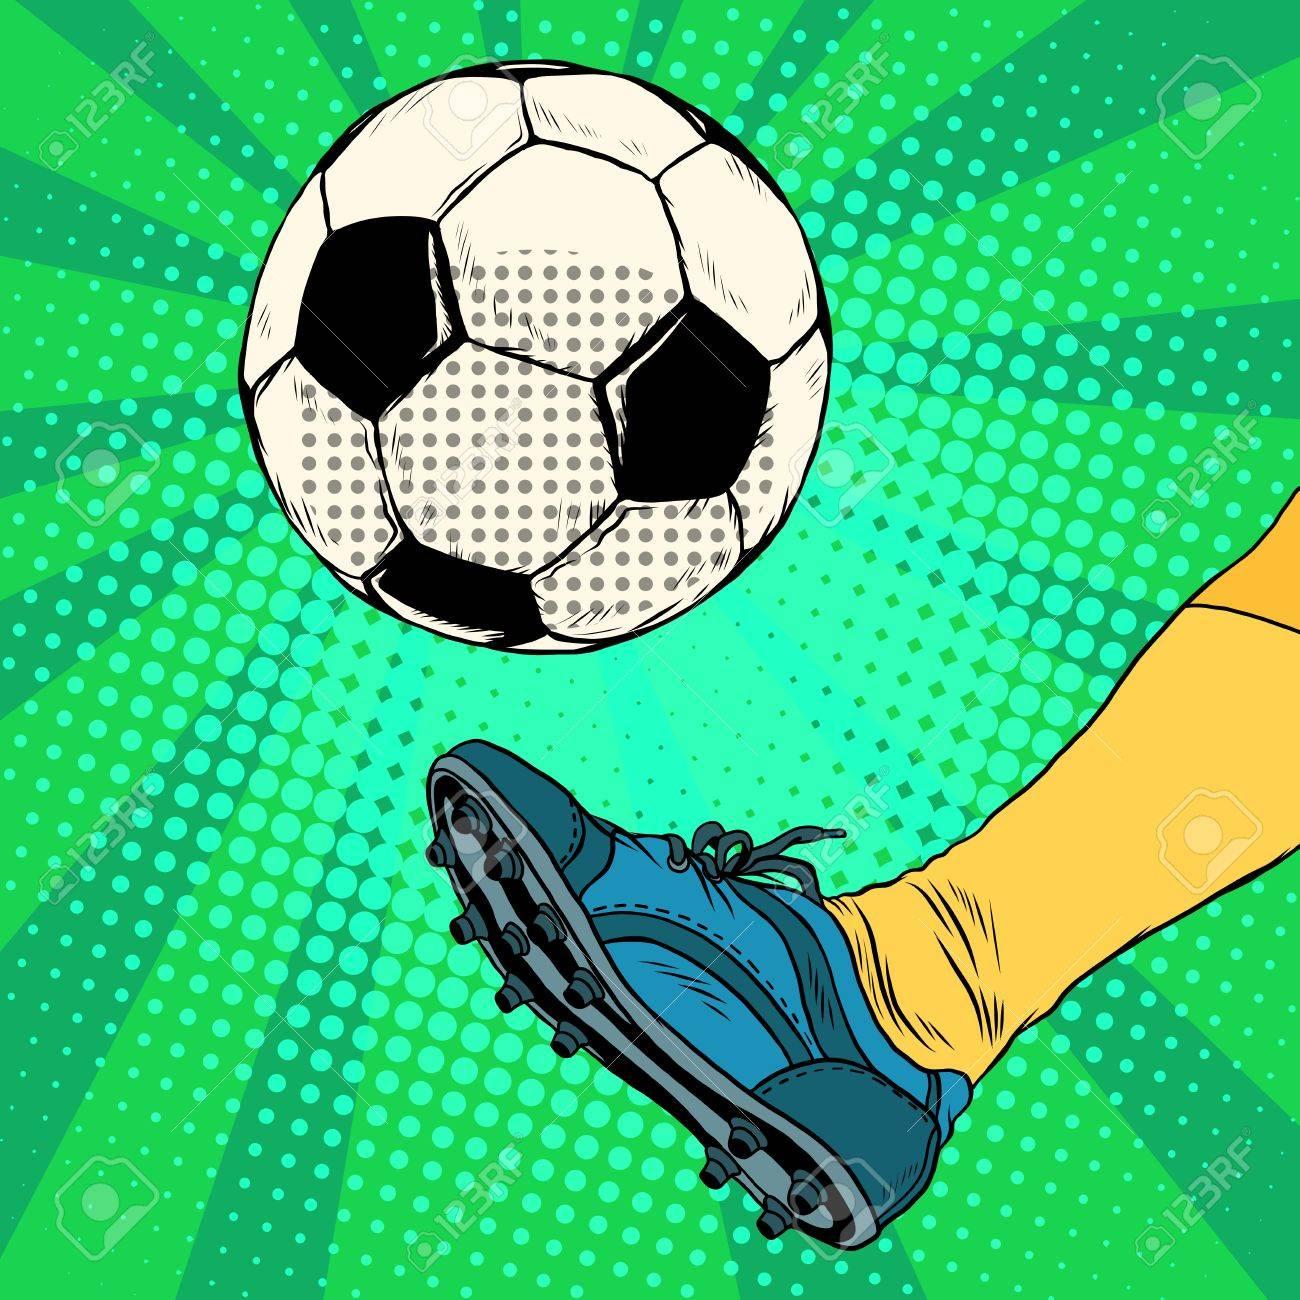 Kick a soccer ball pop art retro style. The European football. The free-kick - 56423937